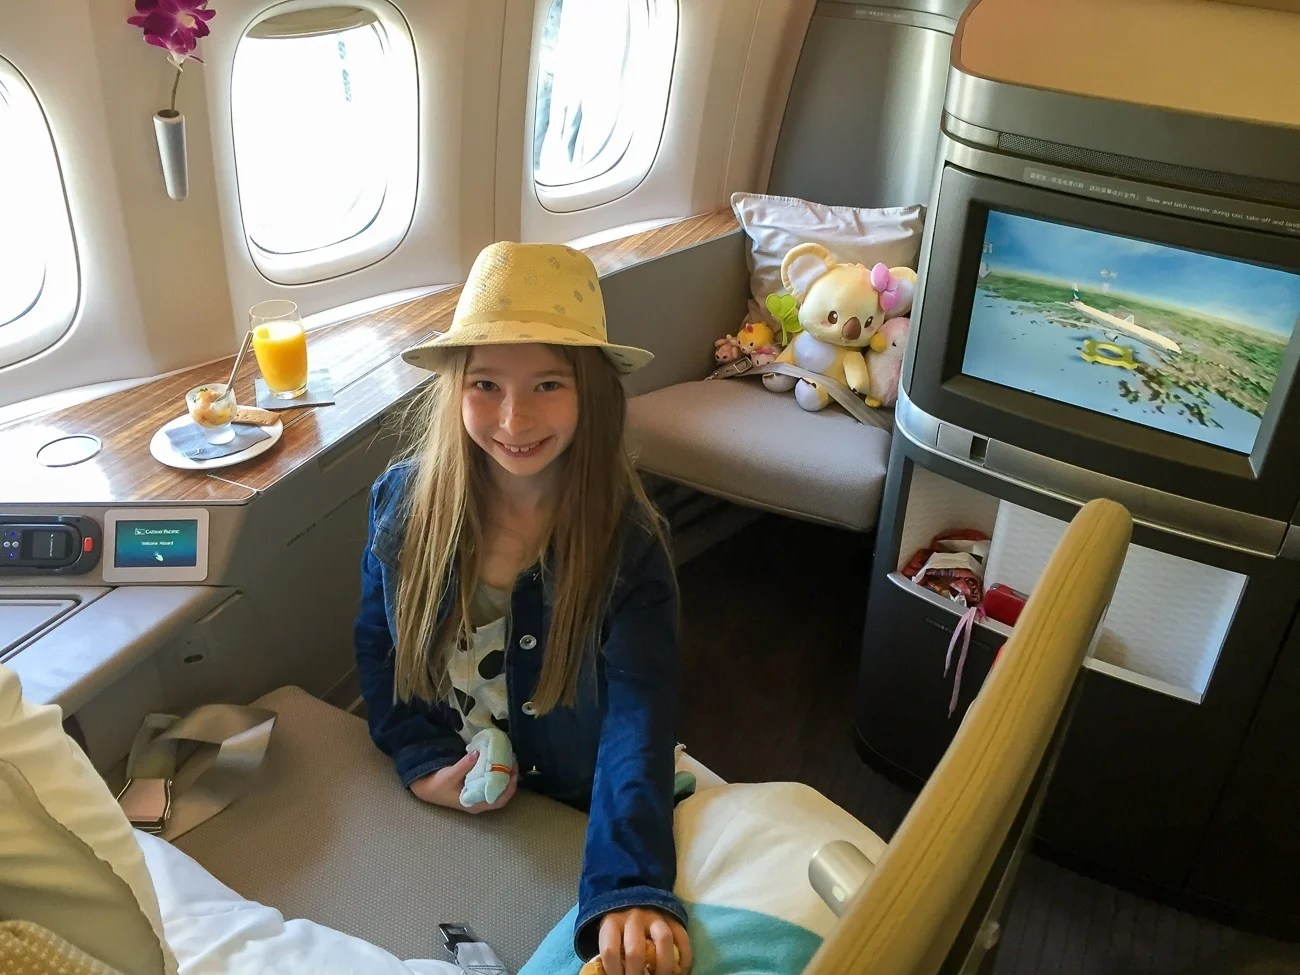 10 Kabin Pesawat First Class Paling Mewah di Dunia Ini Pesawat atau Istana